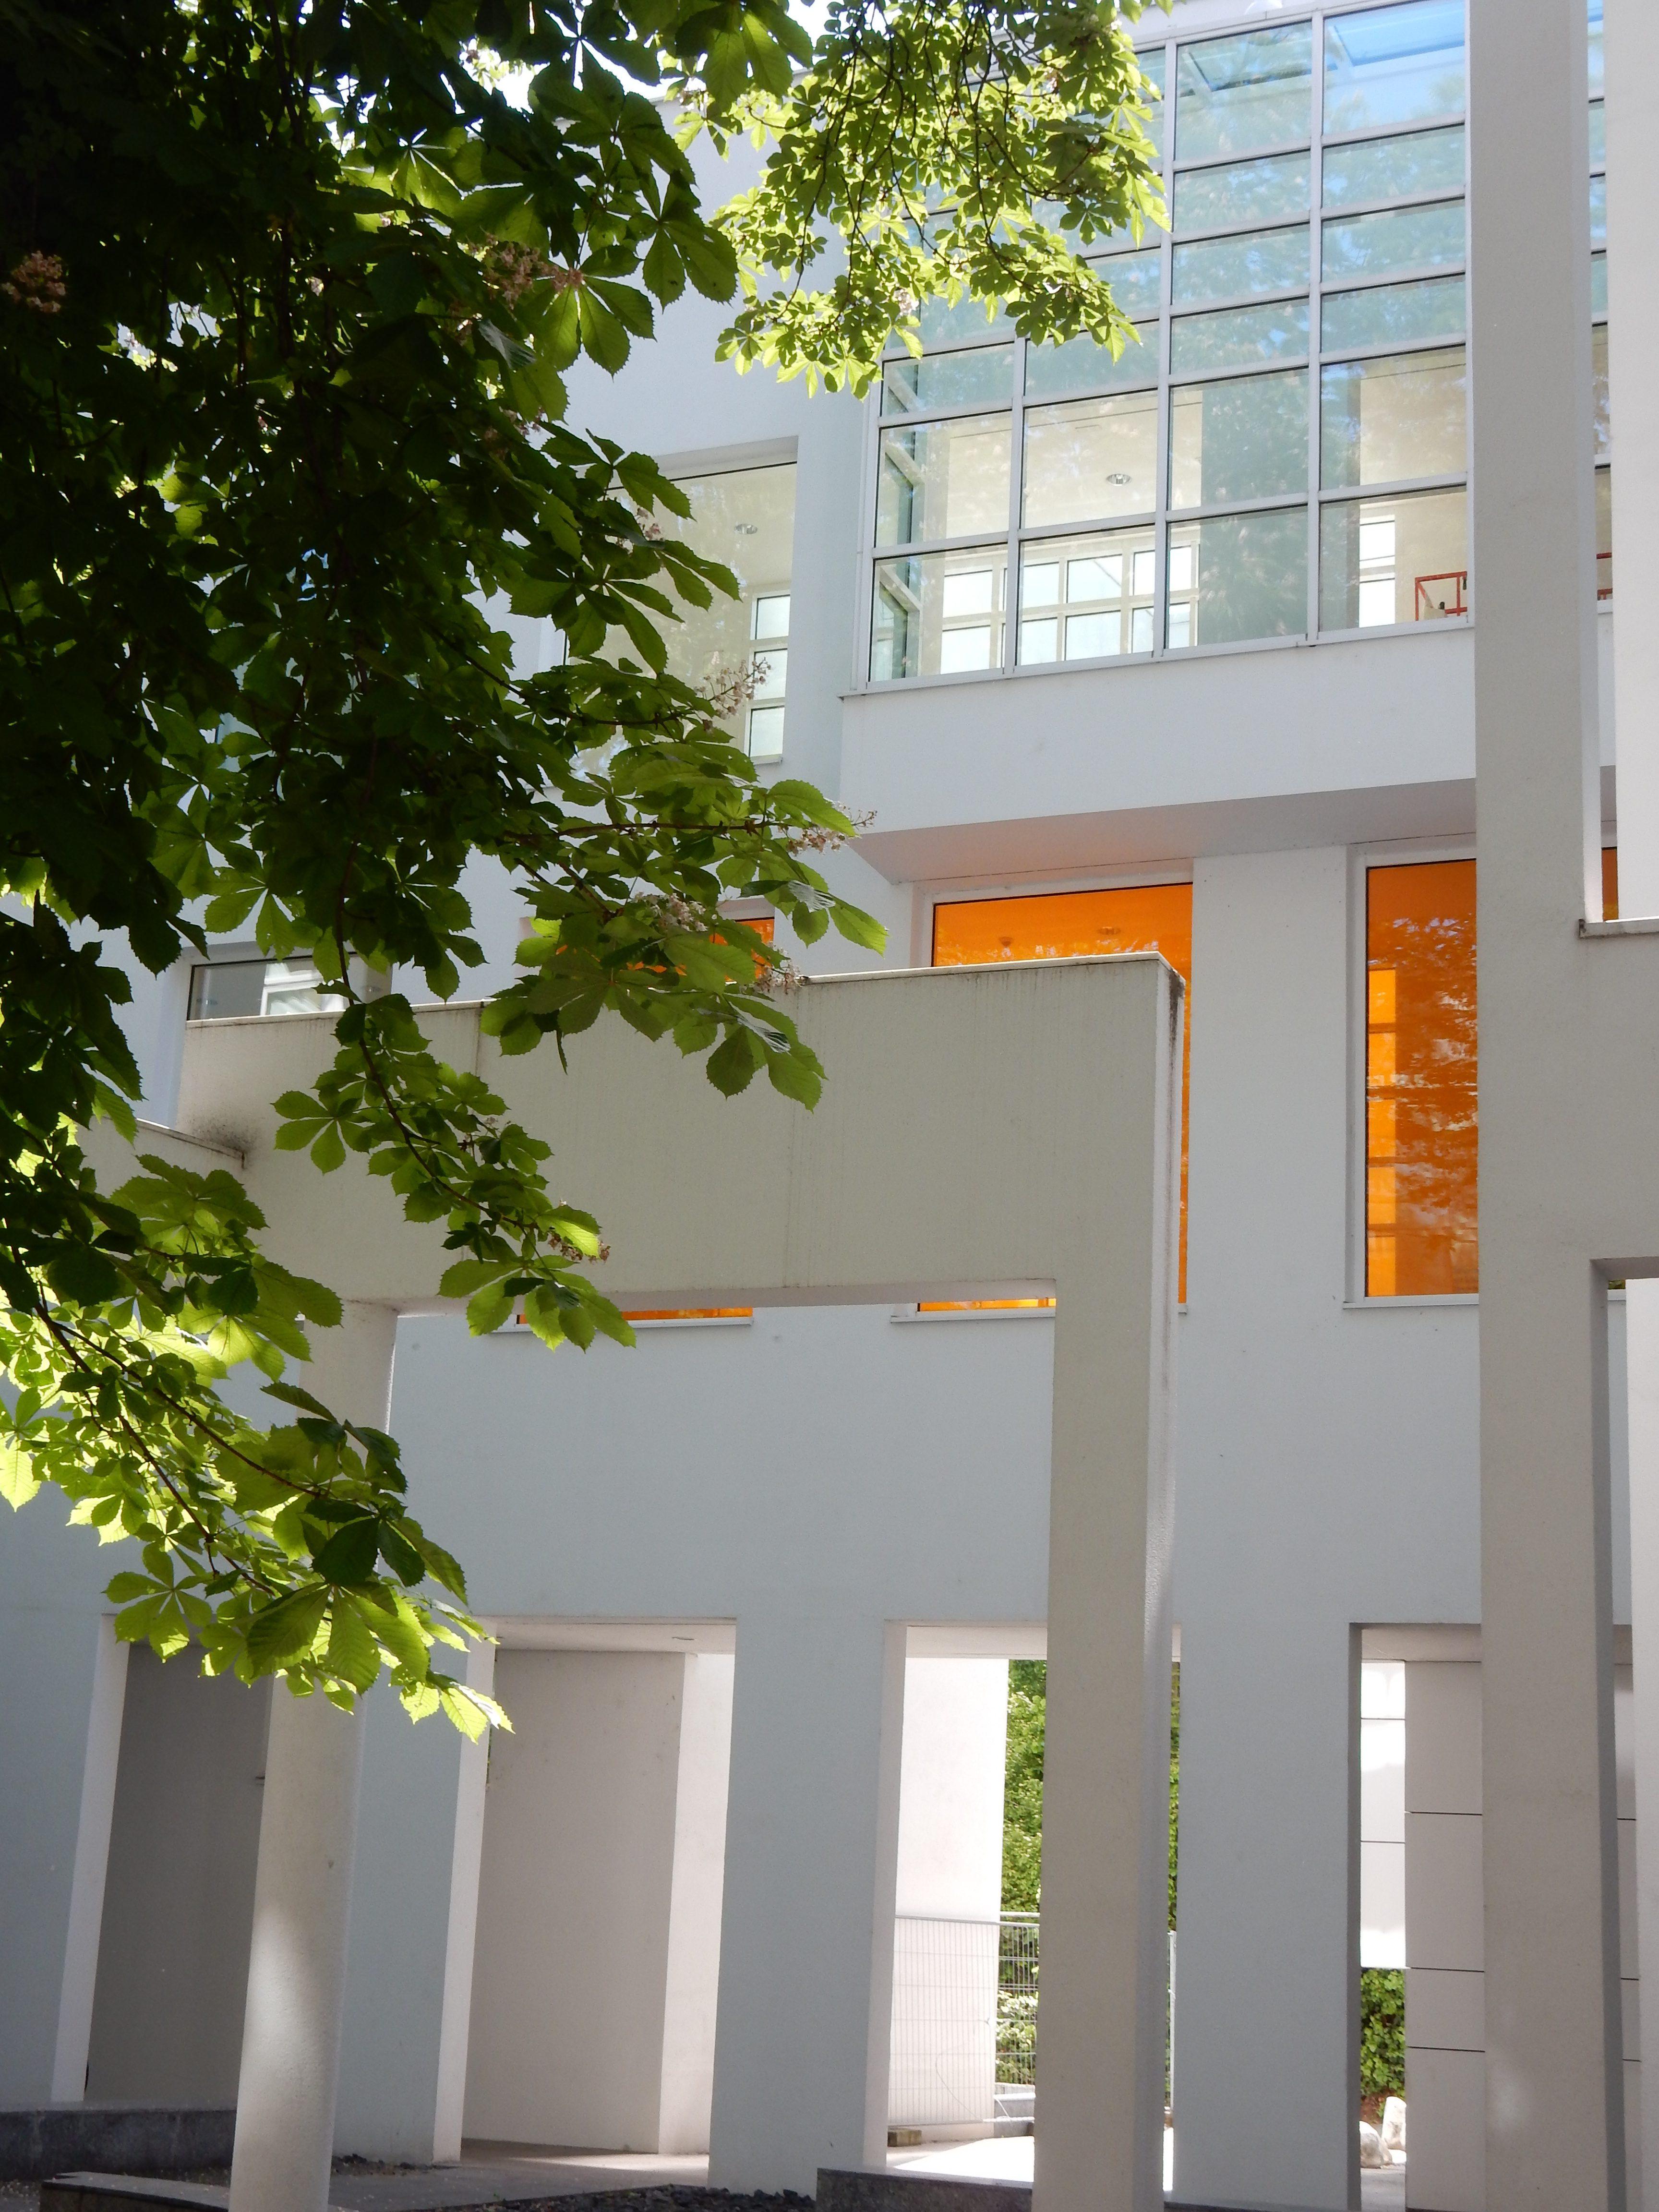 Museum Angewandte Kunst, Frankfurt. Foto Coert Peter Krabbe, mei 2019, gevel, exterieur